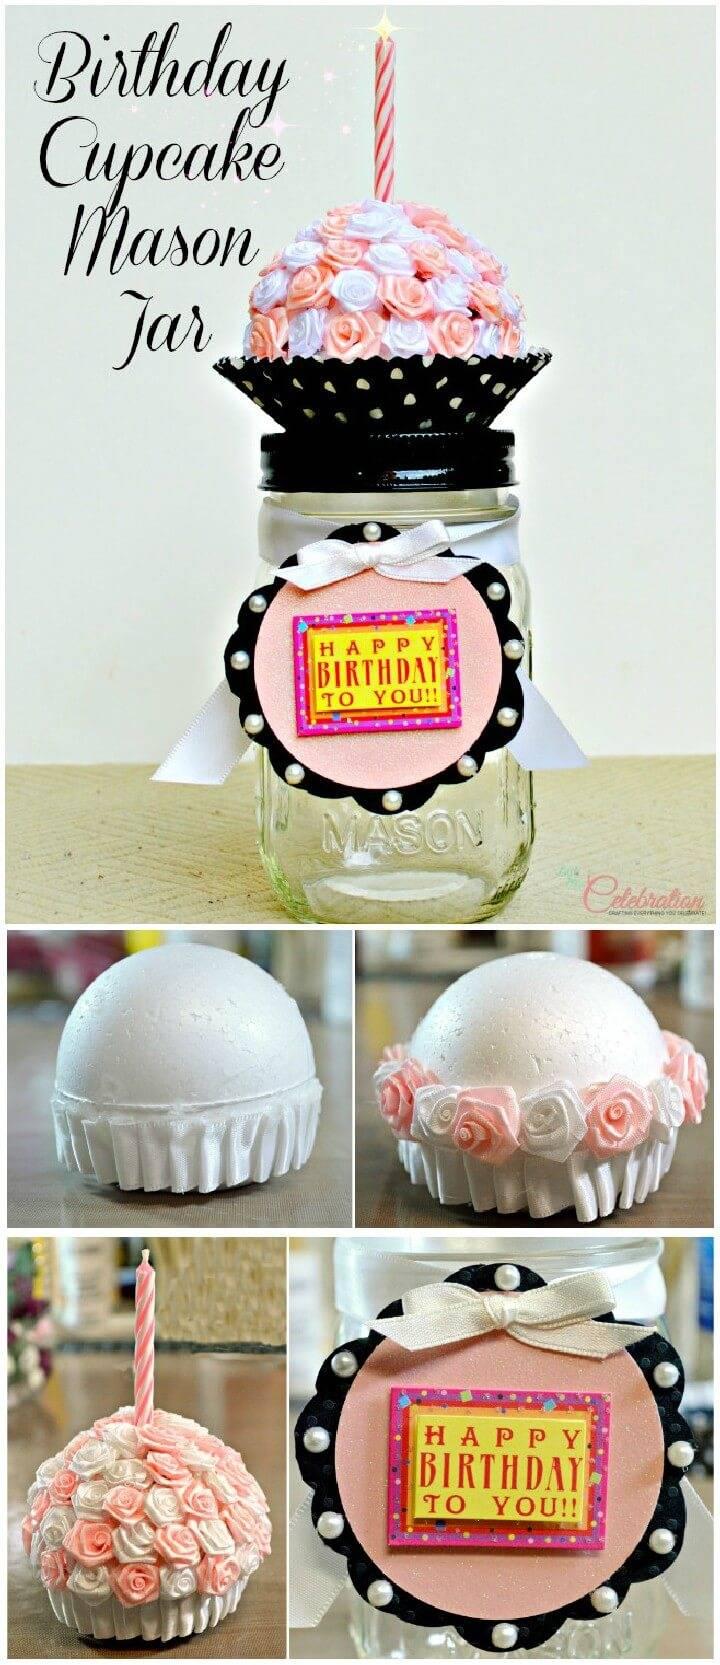 DIY Birthday Cupcake Mason jar Gift